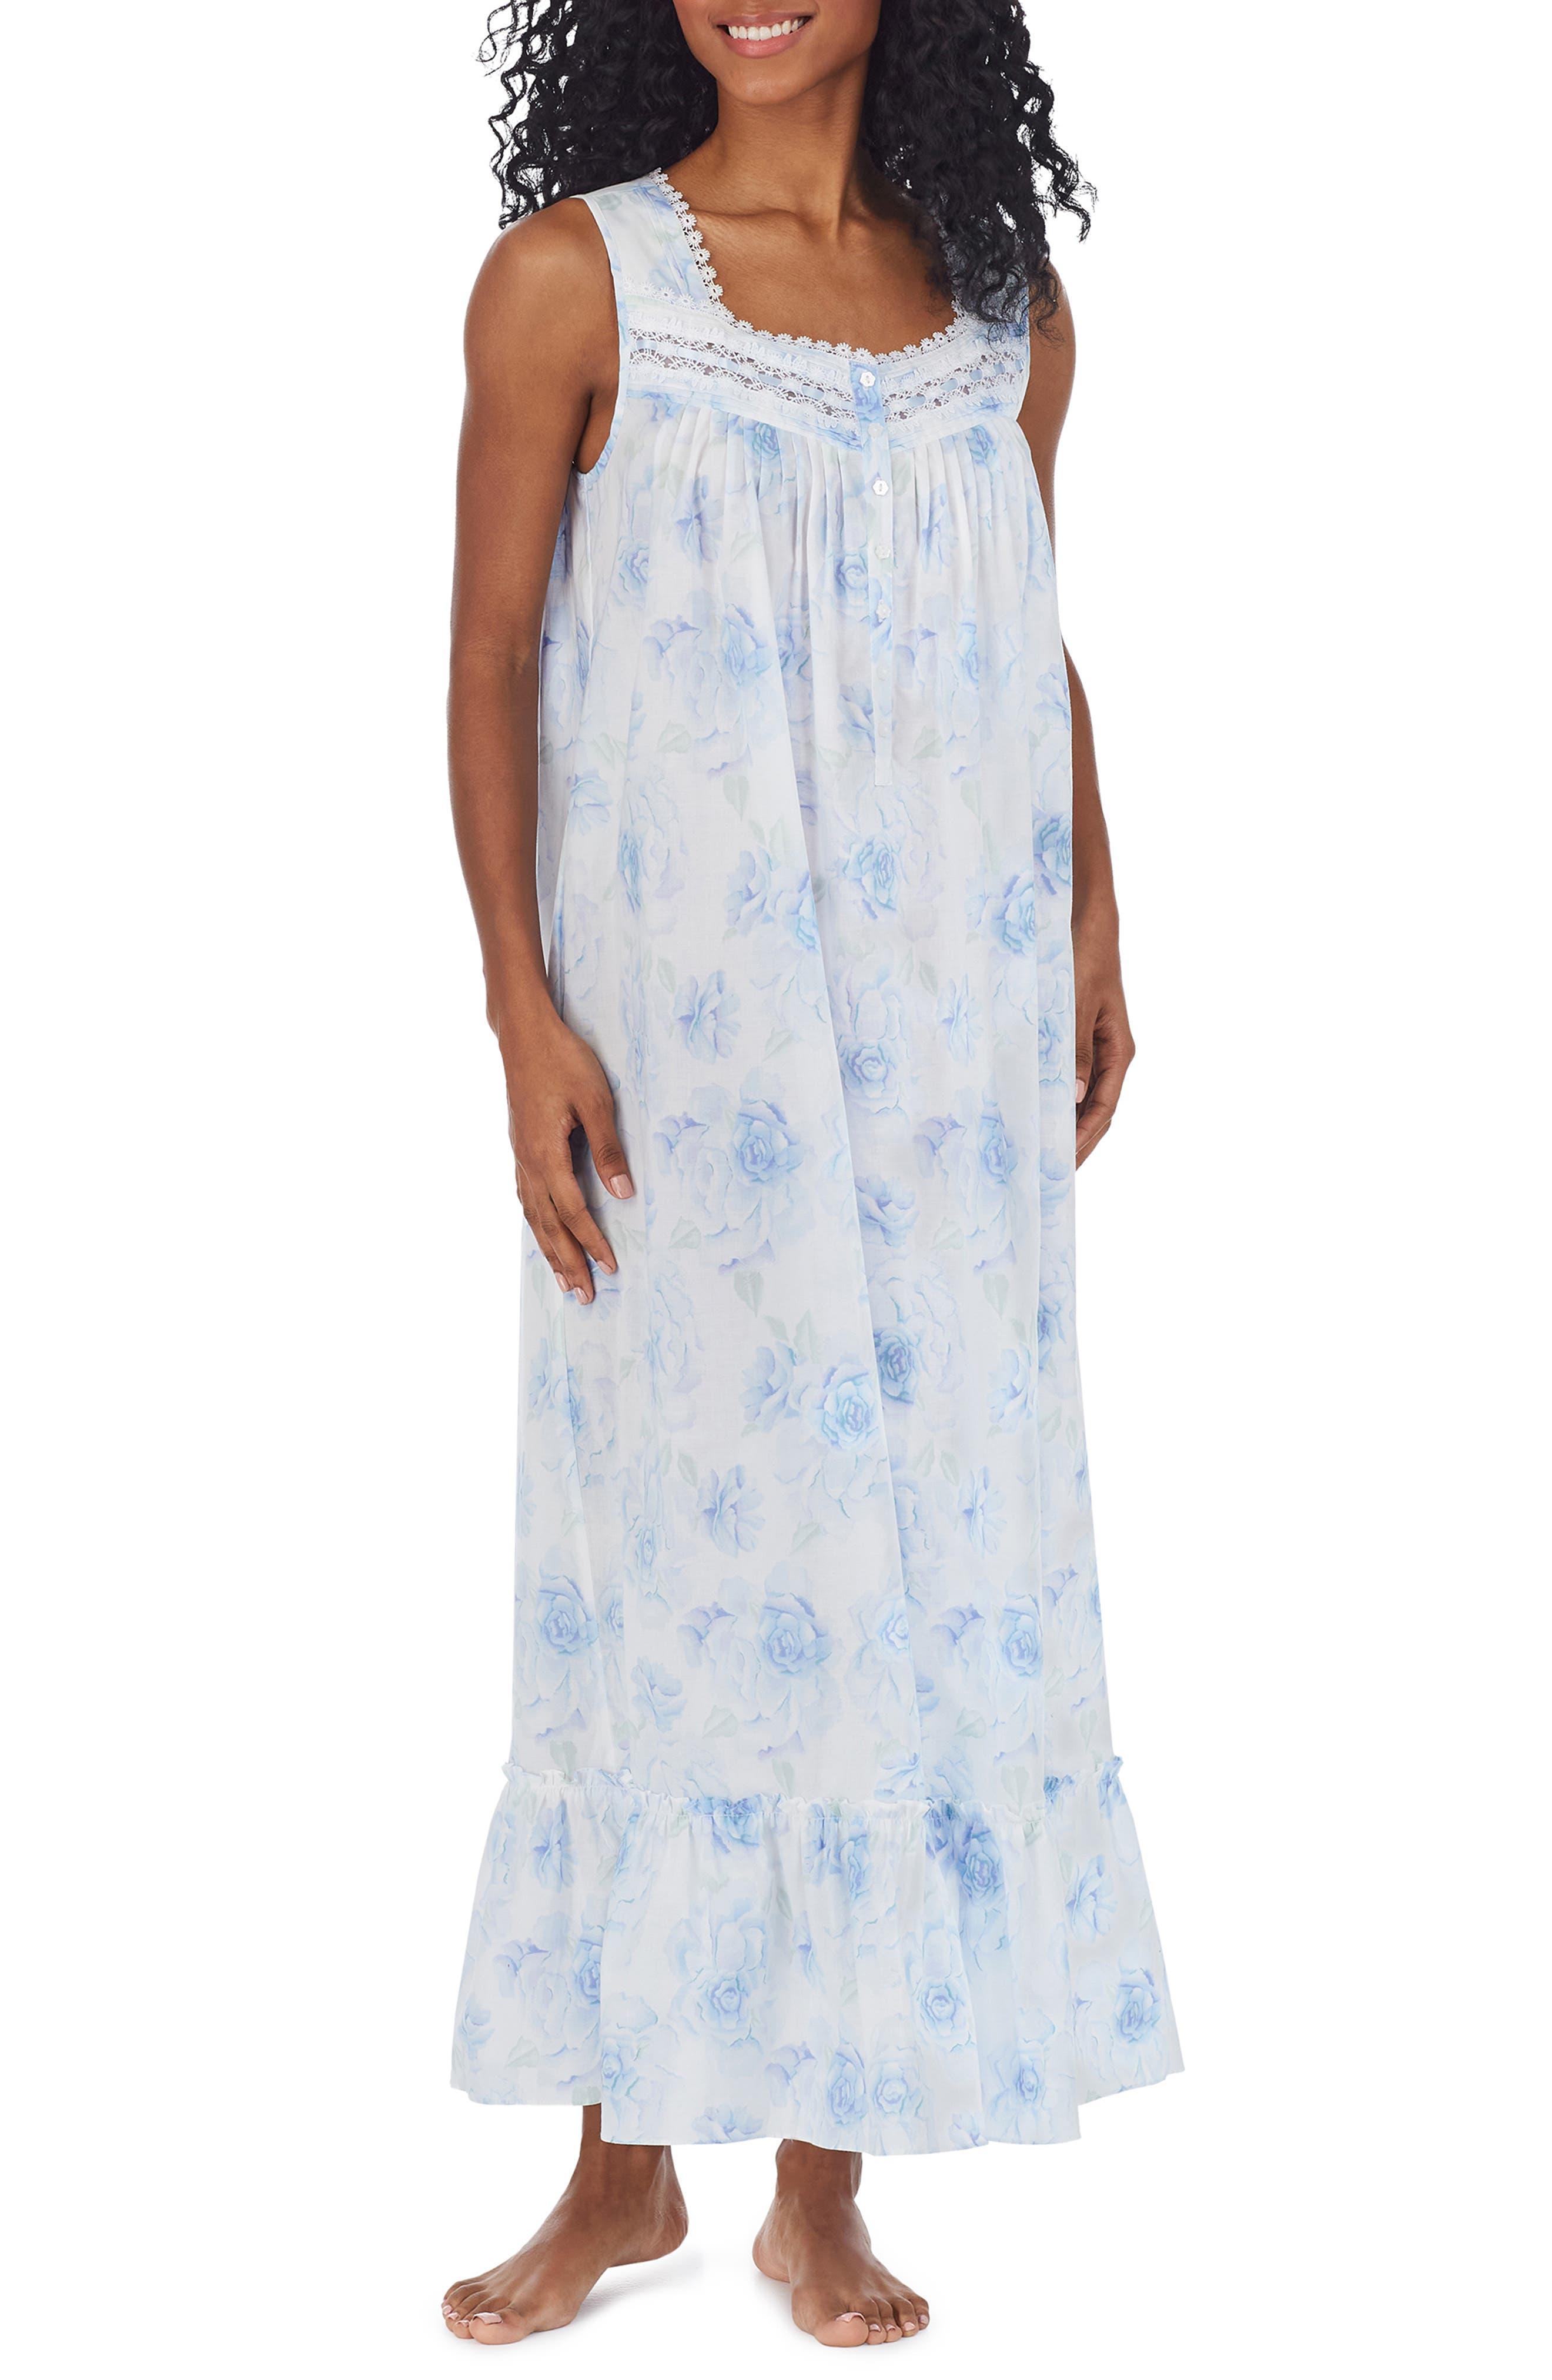 Floral Print Cotton Lawn Ballet Nightgown